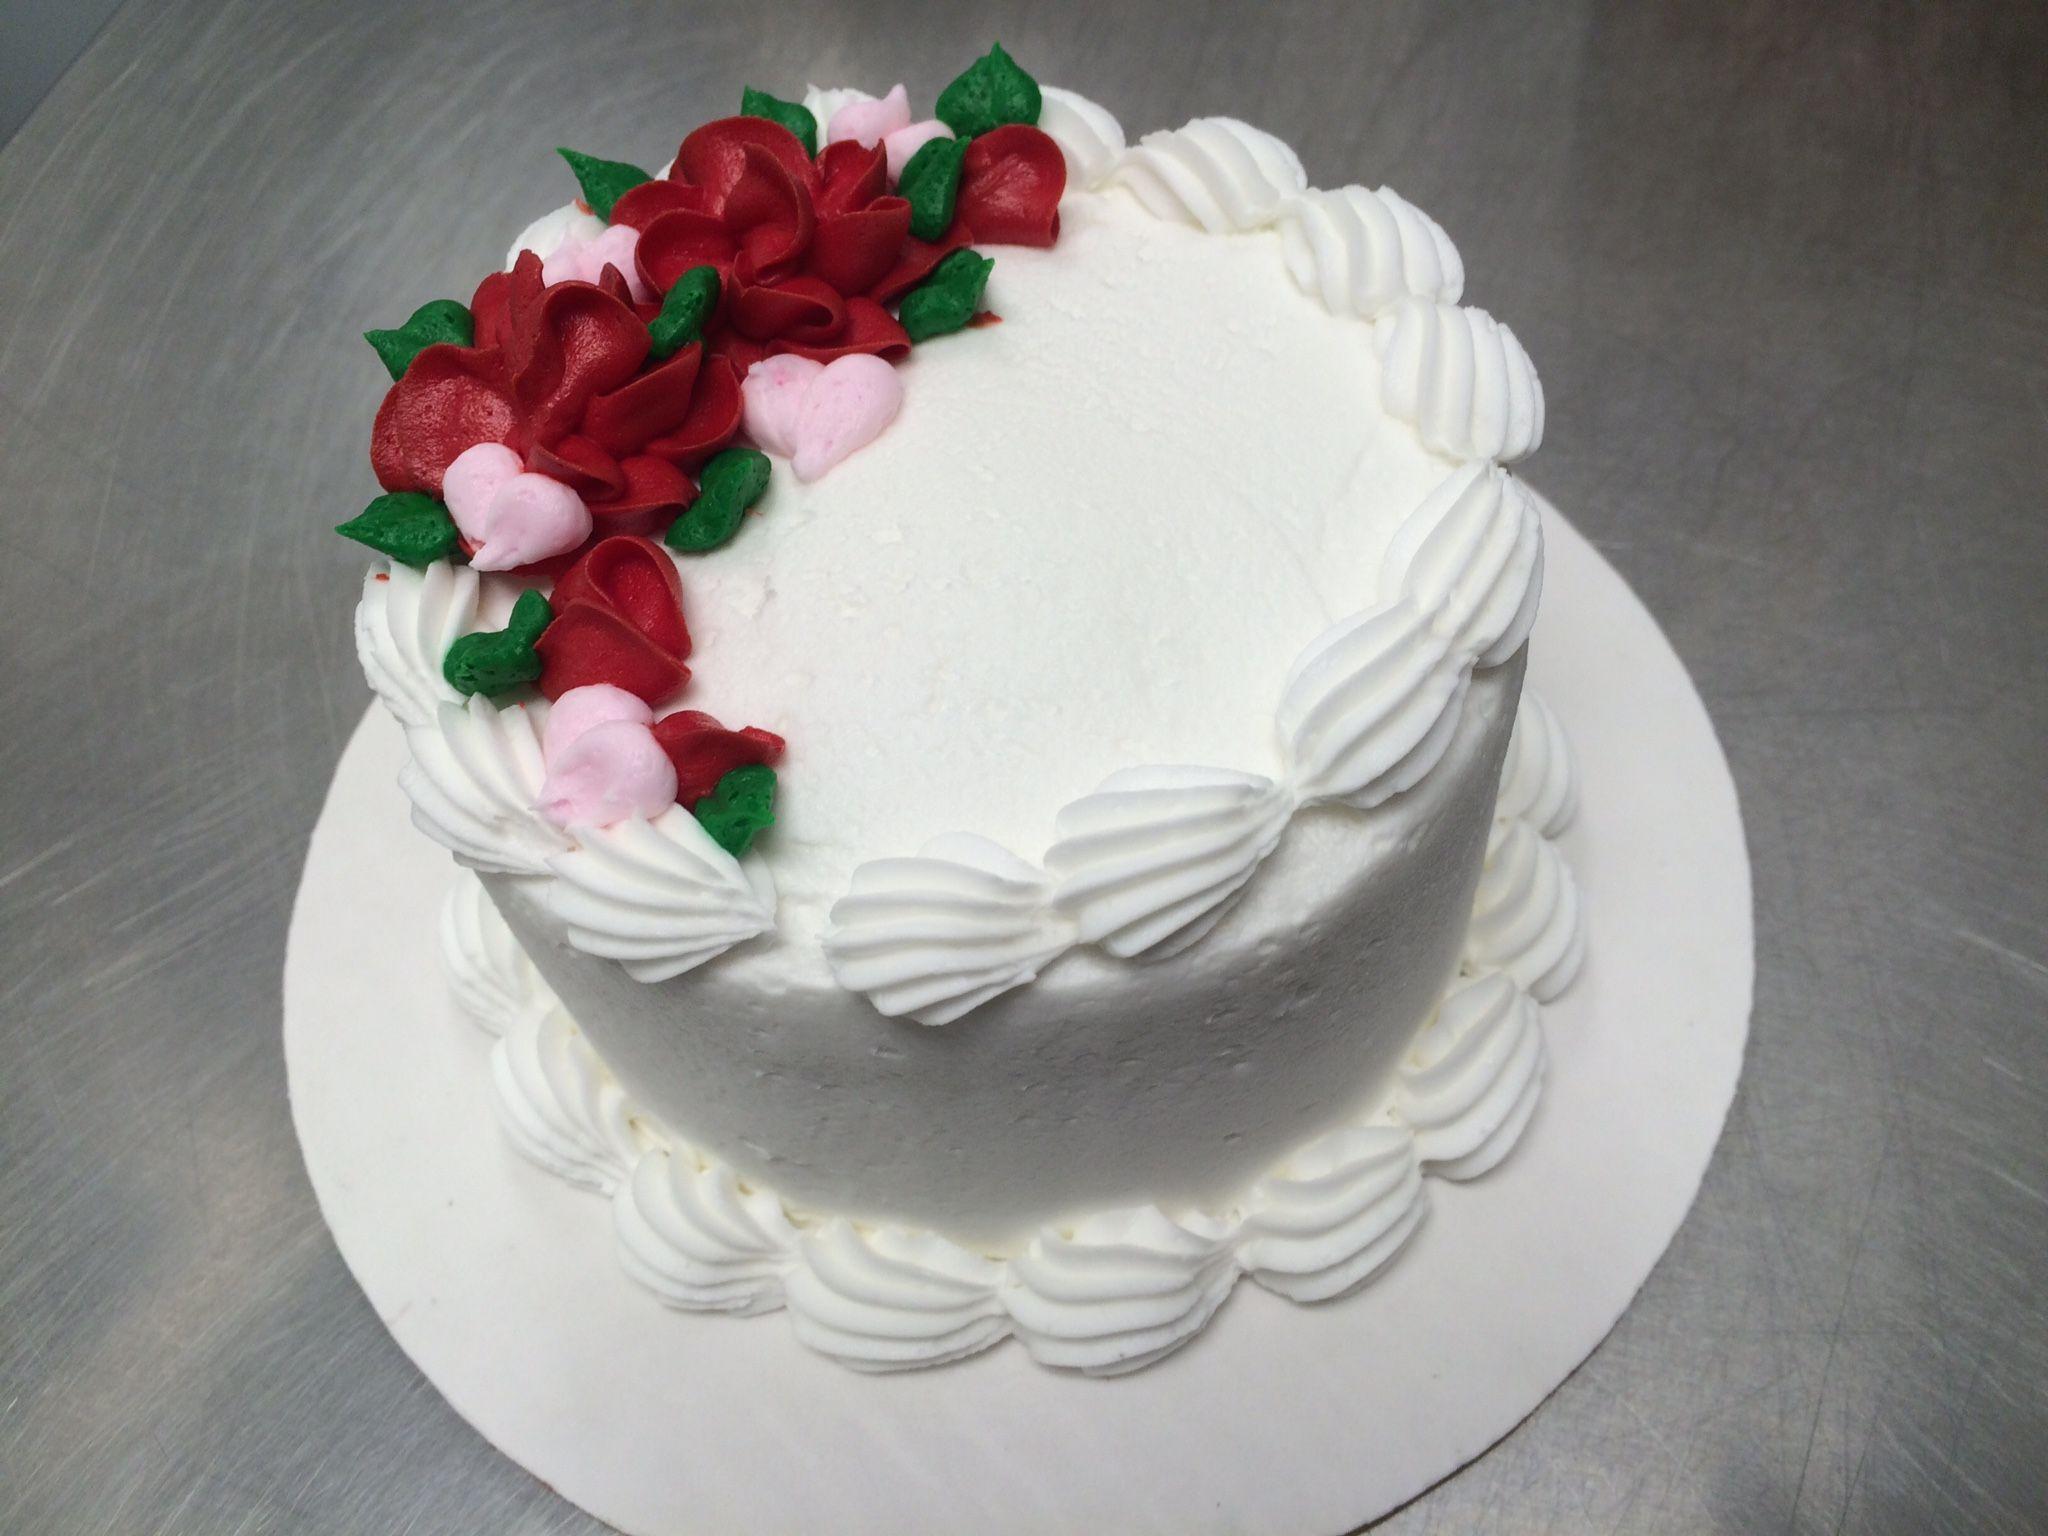 Chocolate Drip Cake with lots of chocolate Goodies | Cake